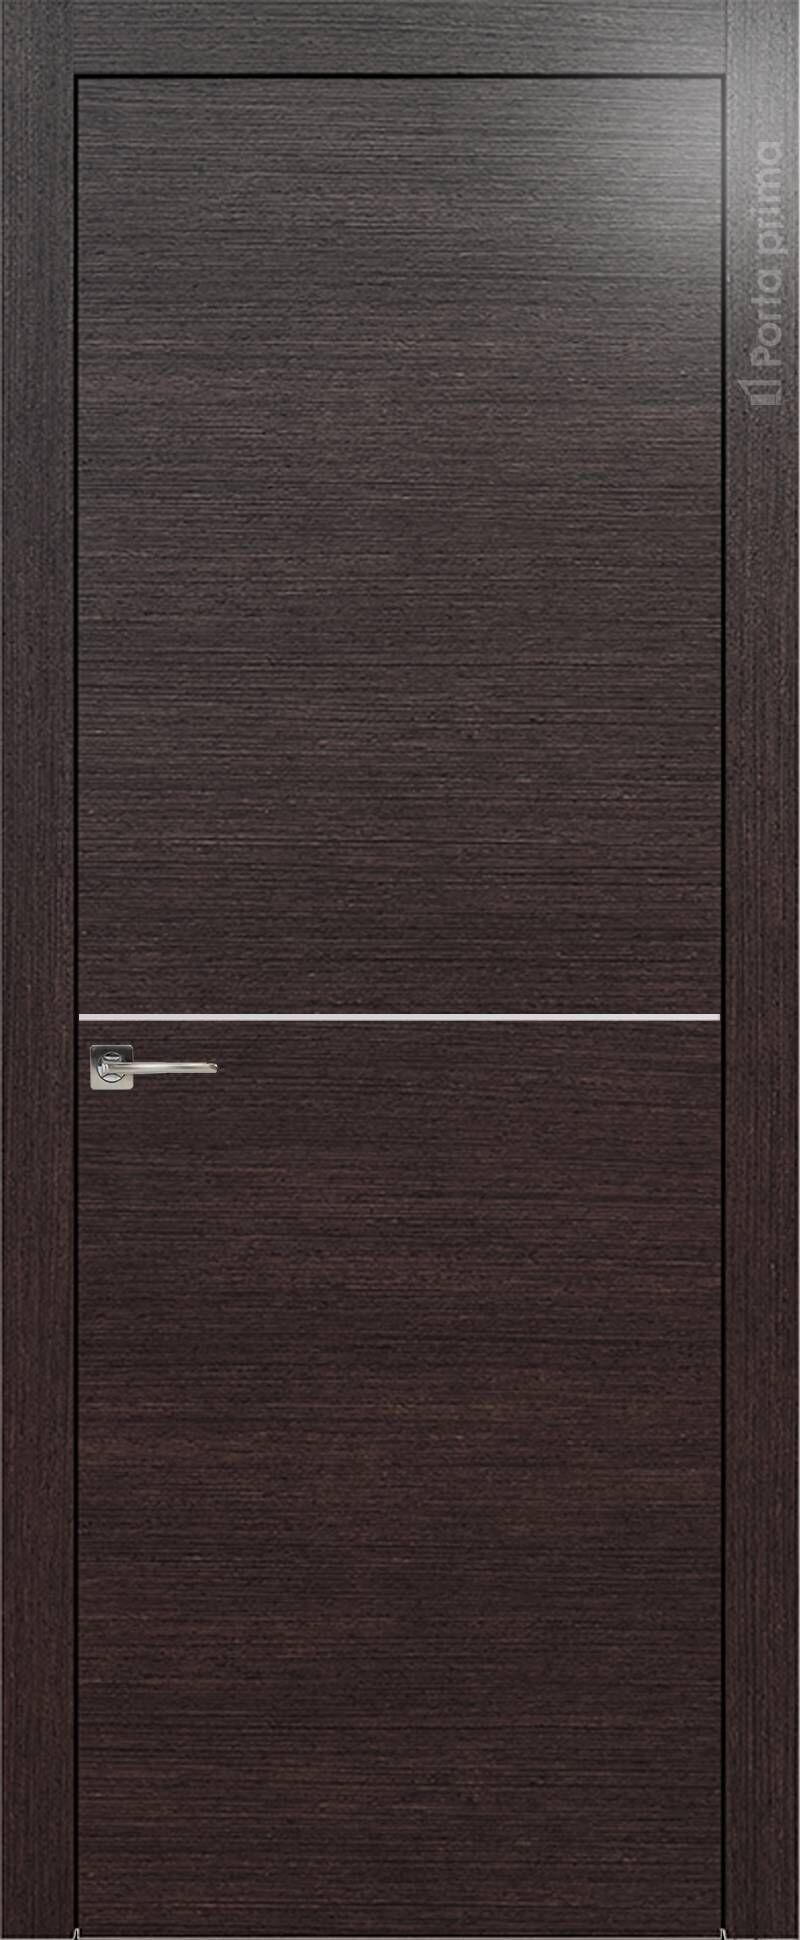 Tivoli Б-3 цвет - Венге Шоколад Без стекла (ДГ)